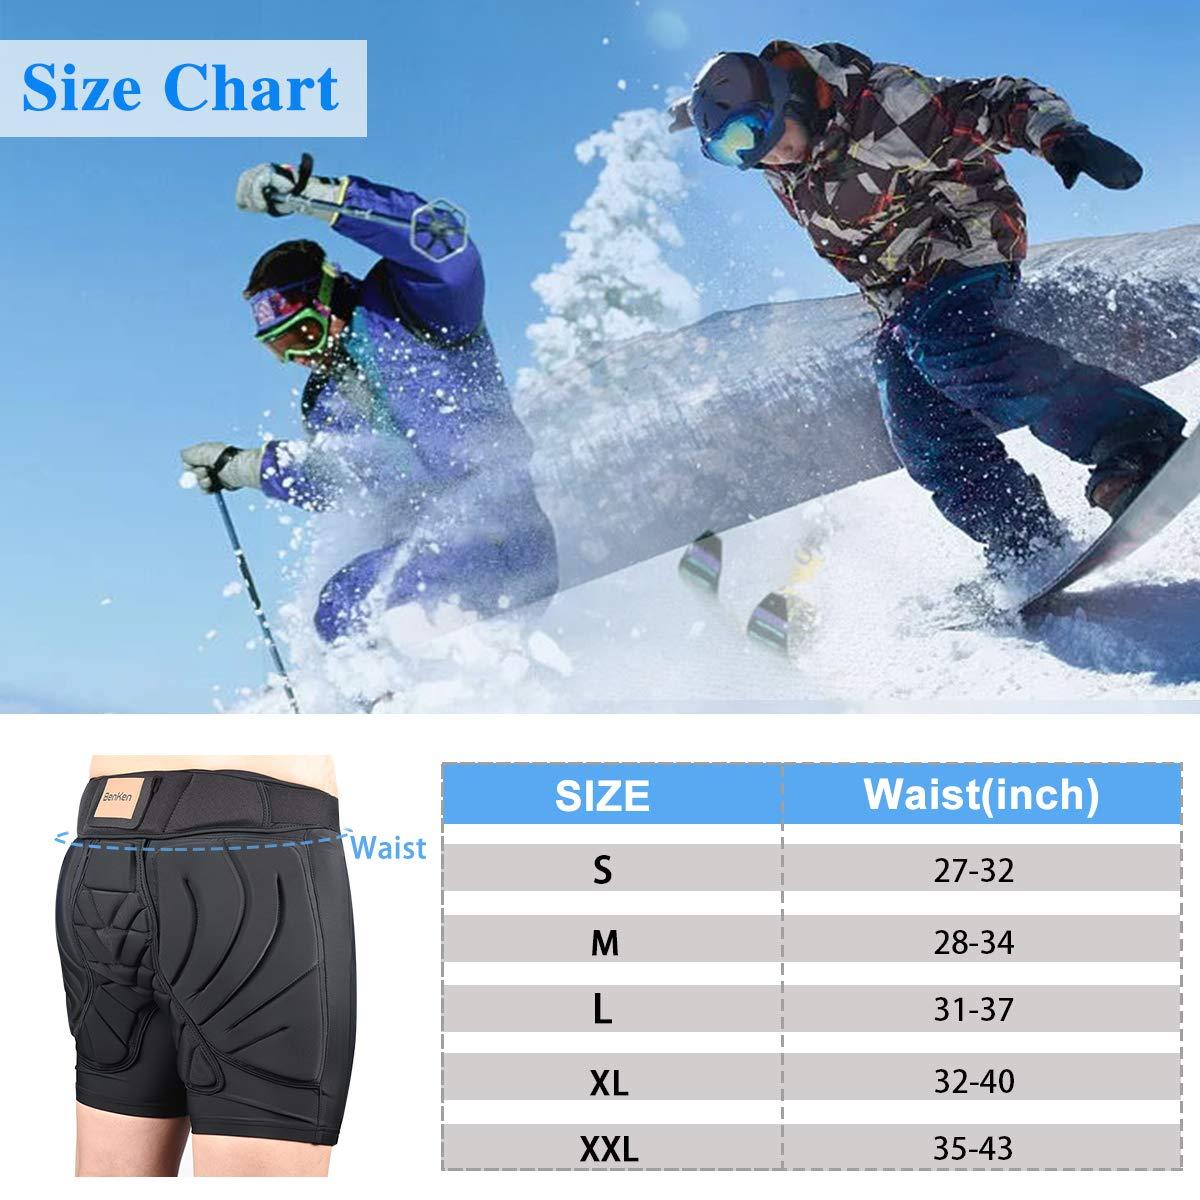 BENKEN Skiing Protective Padded Shorts Hosen Frauen M/änner 3D-Schutz Hip Butt Guard Pad Atmungsaktive Schlagfestigkeit f/ür Snowboarden L